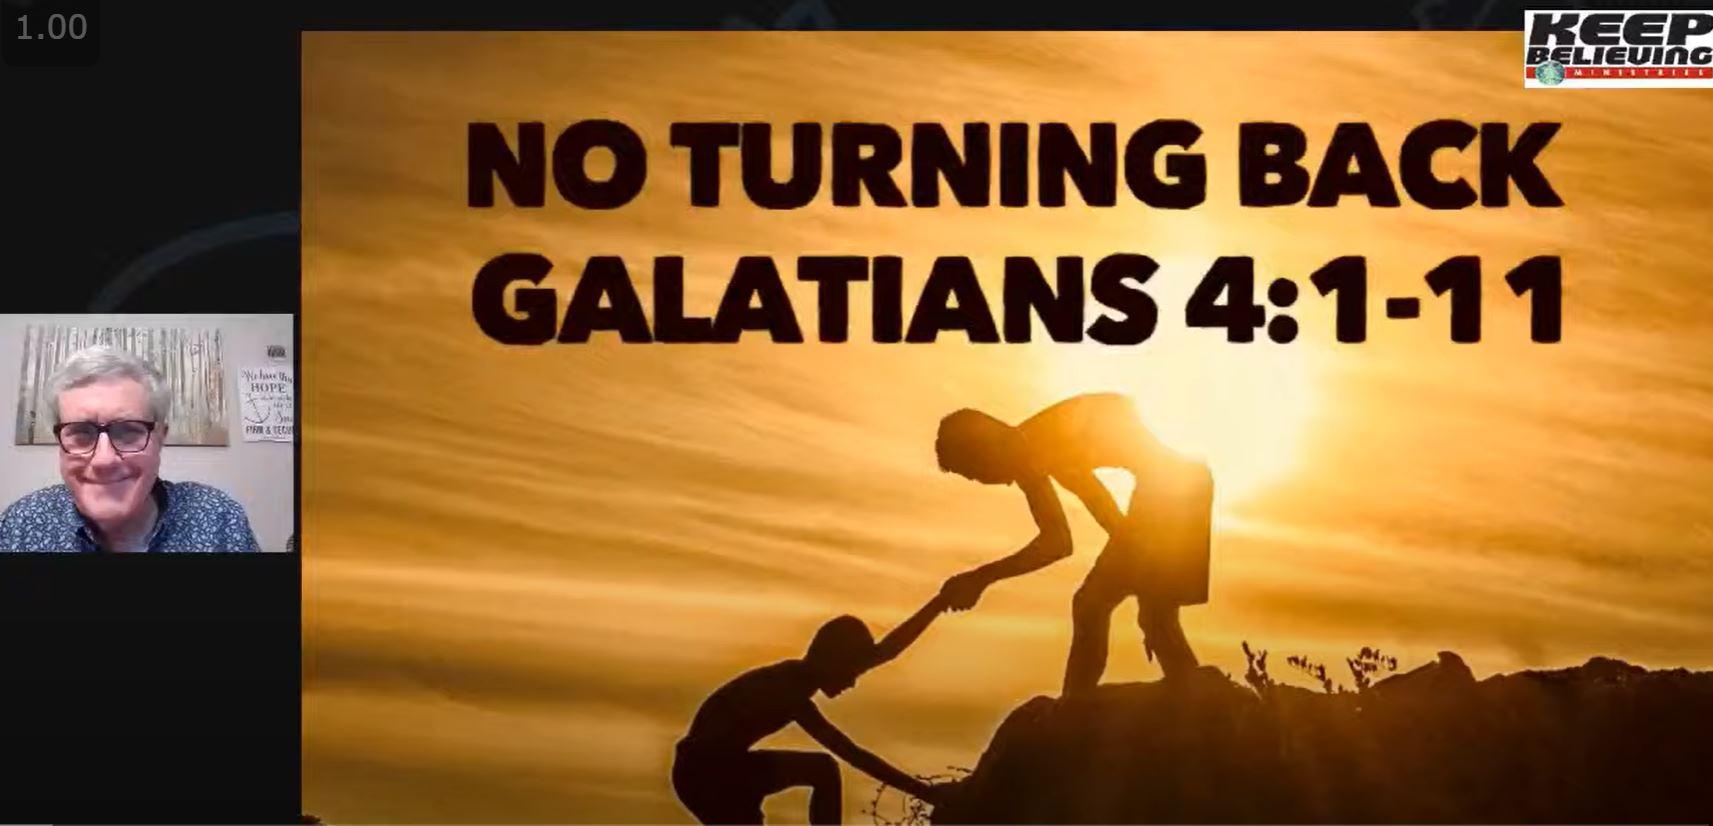 No Turning Back (Galatians 4:1-11)